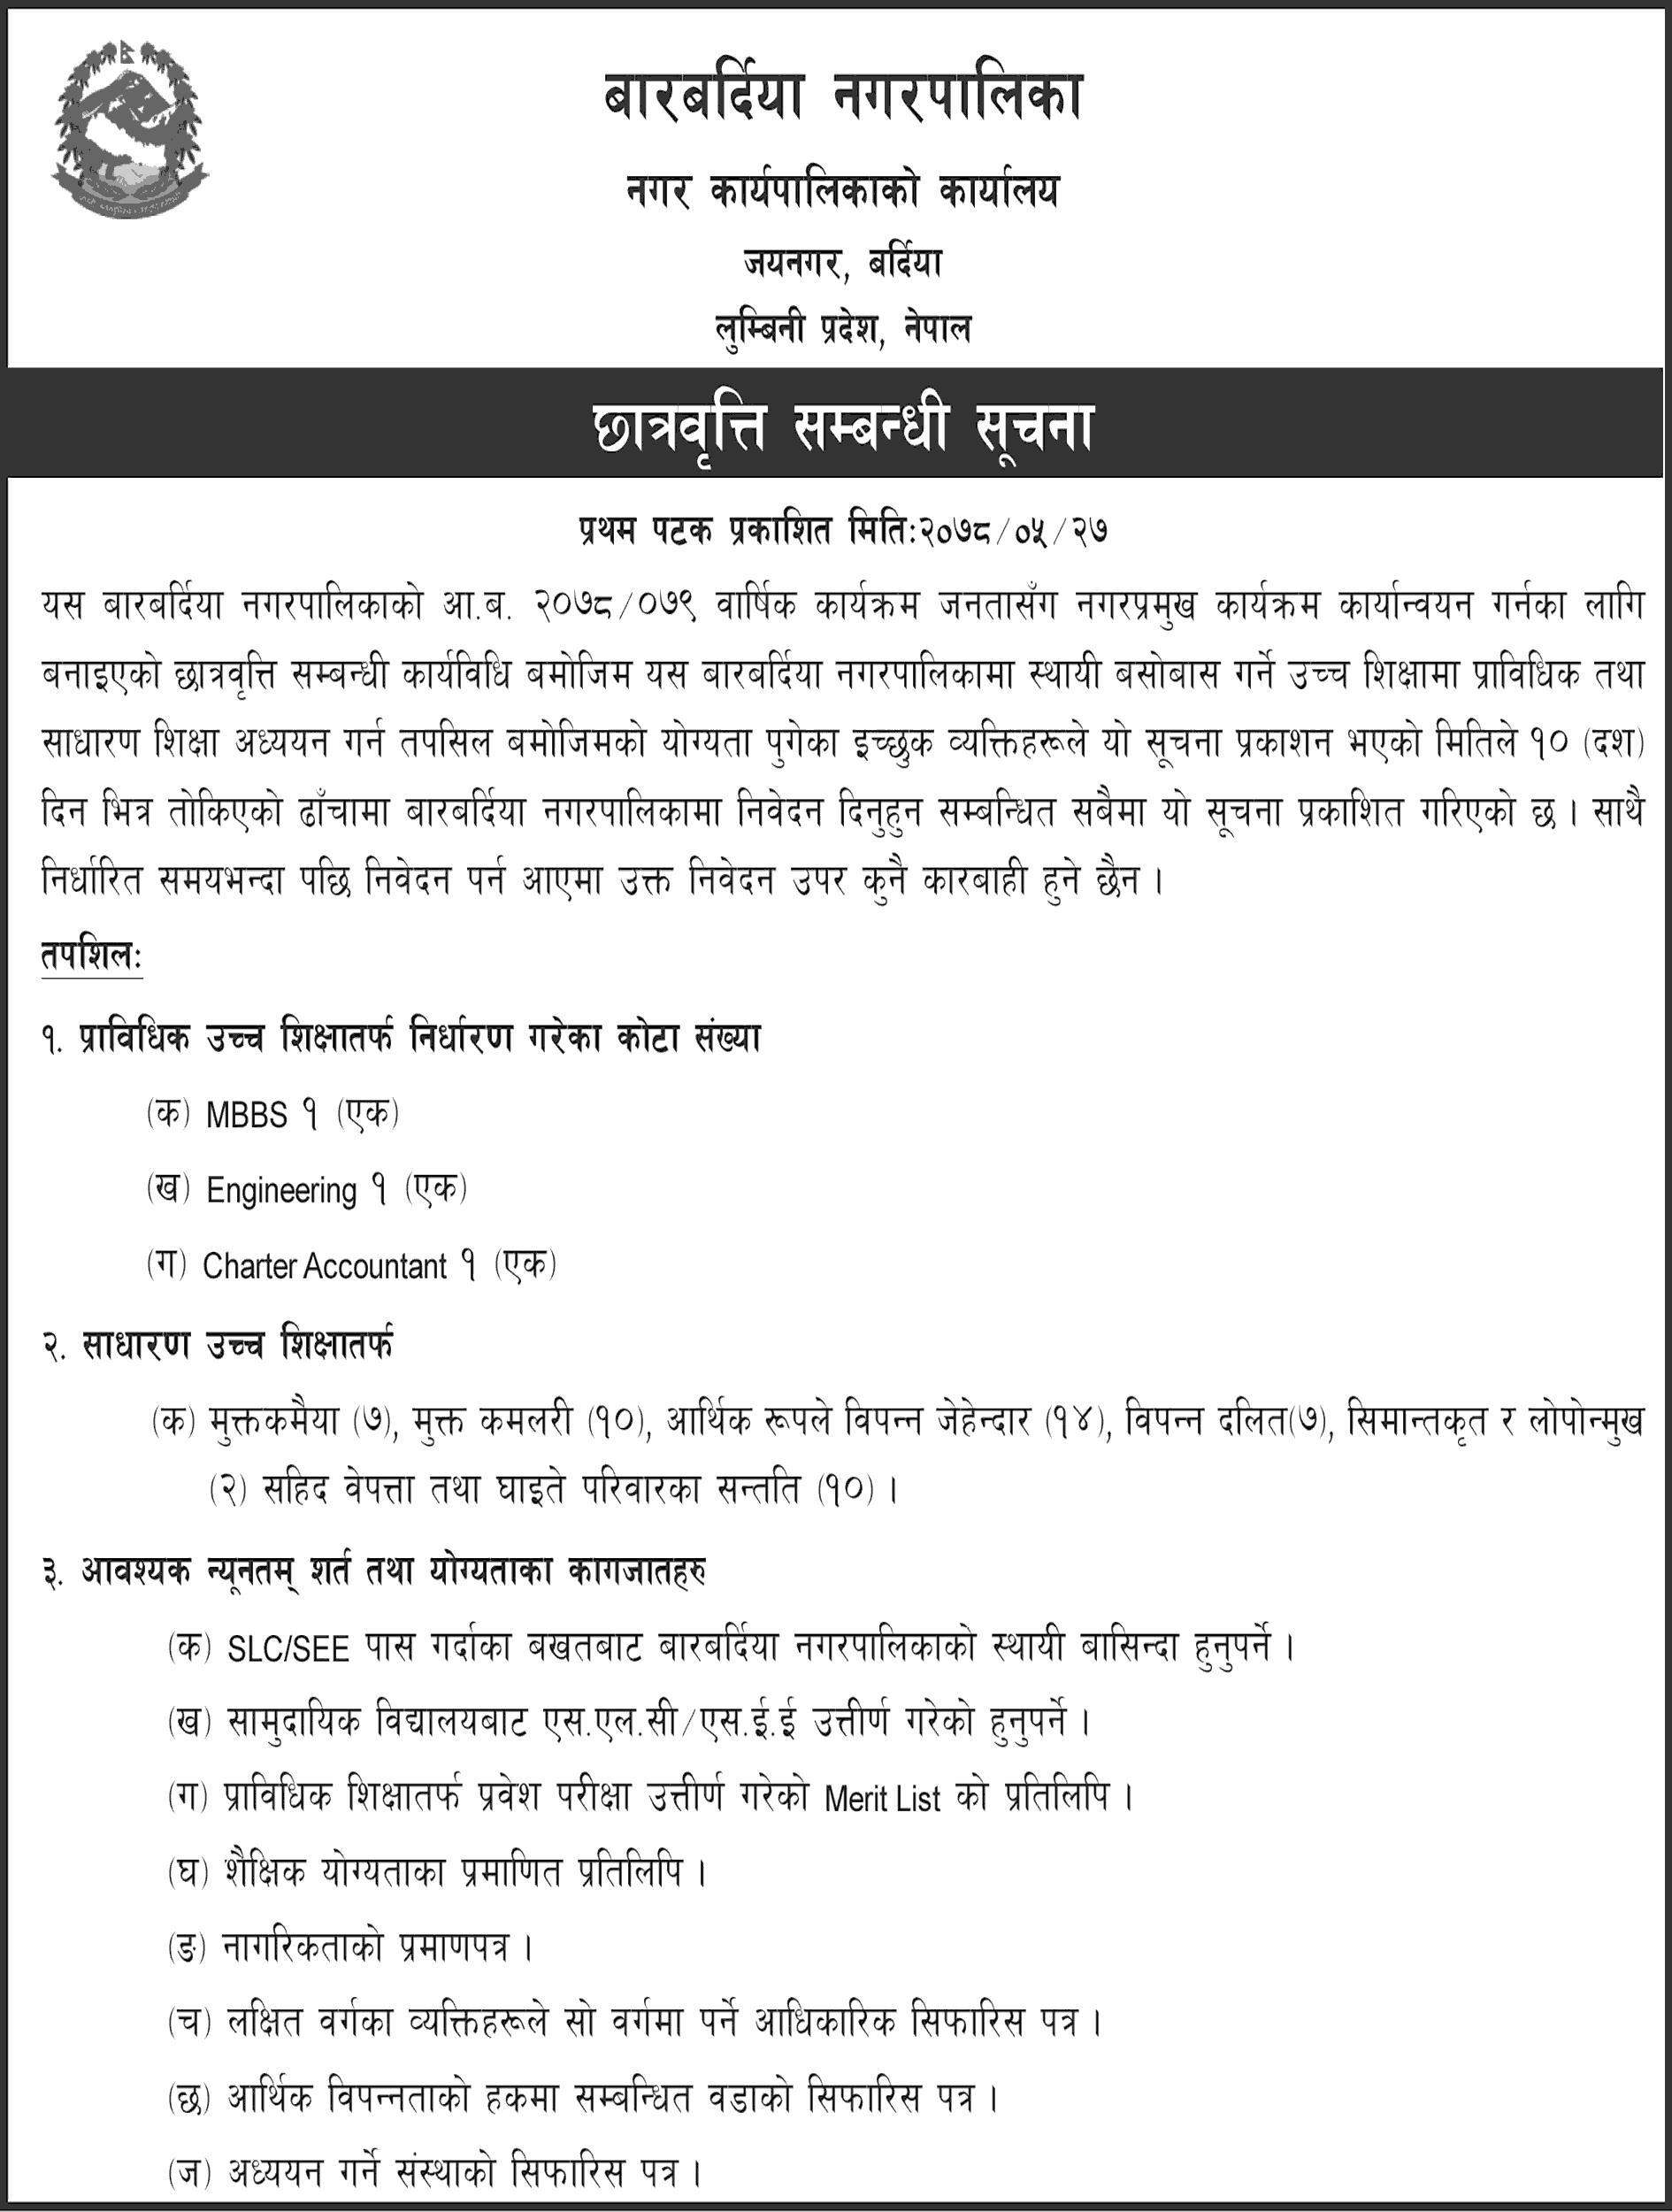 MBBS, Engineering, CA and Higher Education Scholarship from Barbardiya Municipality